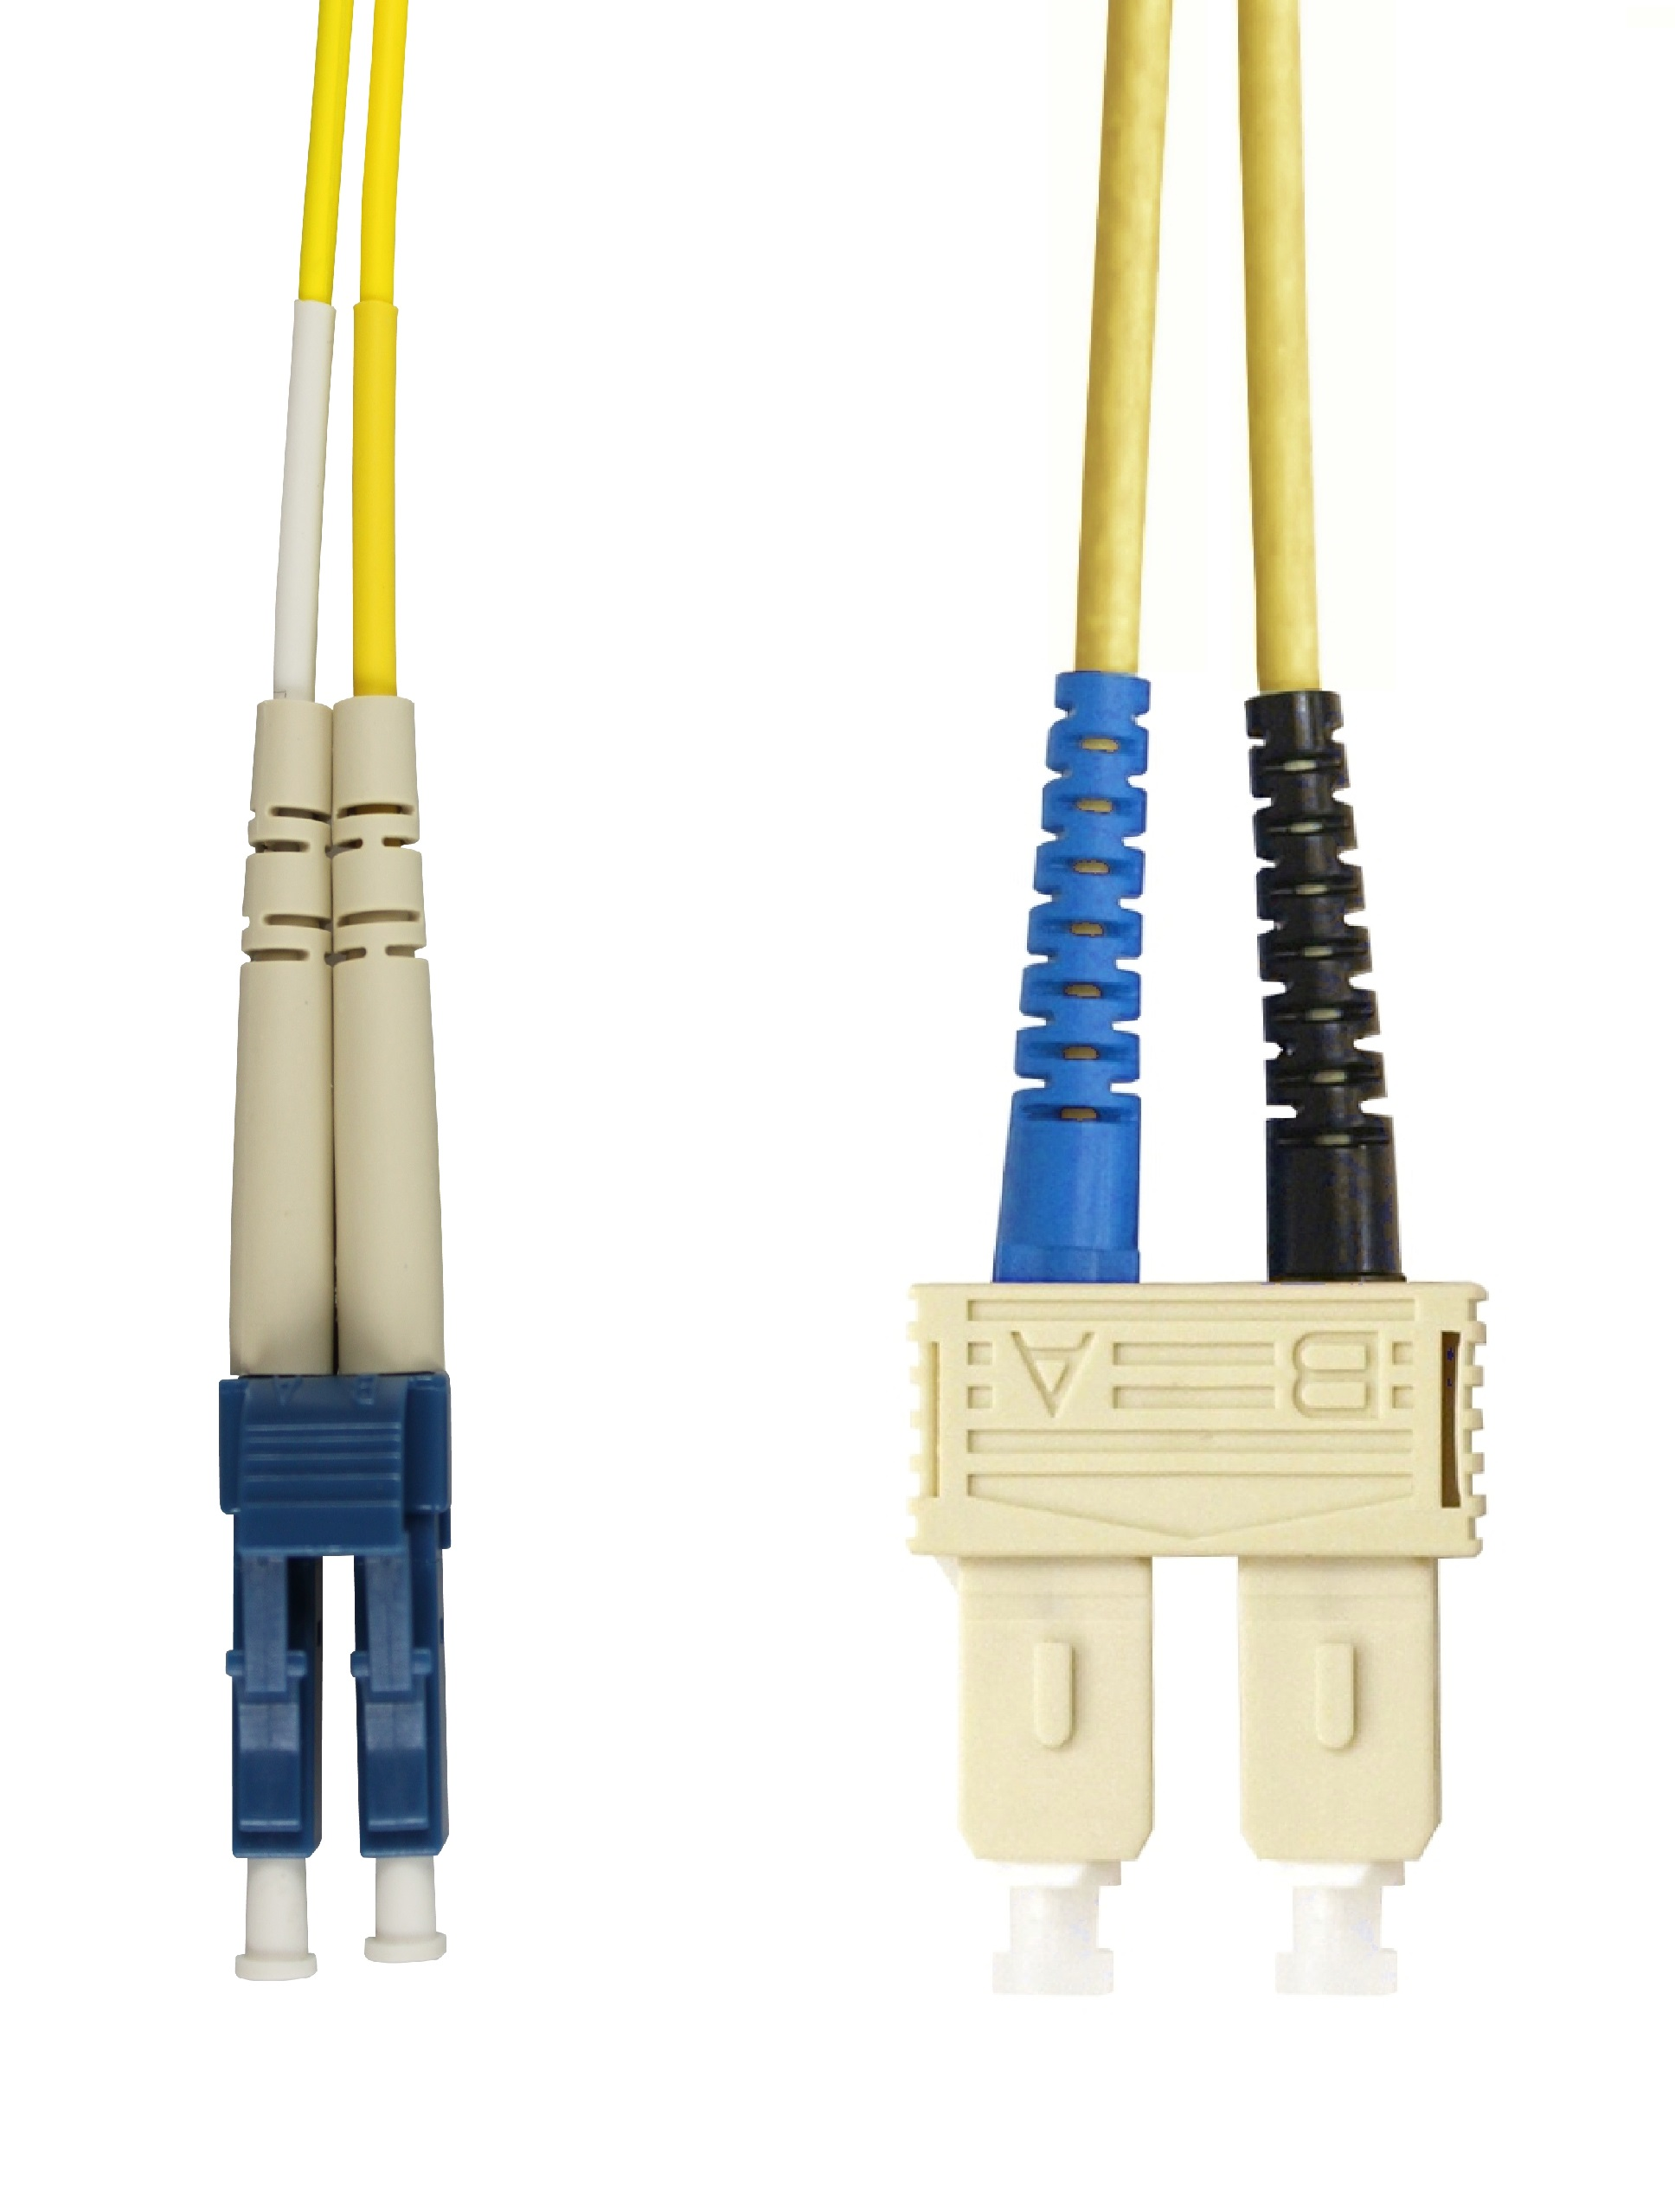 1 Stk LWL Patchkabel Duplex LC/SC, 9/125µm OS2, LS0H-3, gelb, 3.0m HLP29LC03F